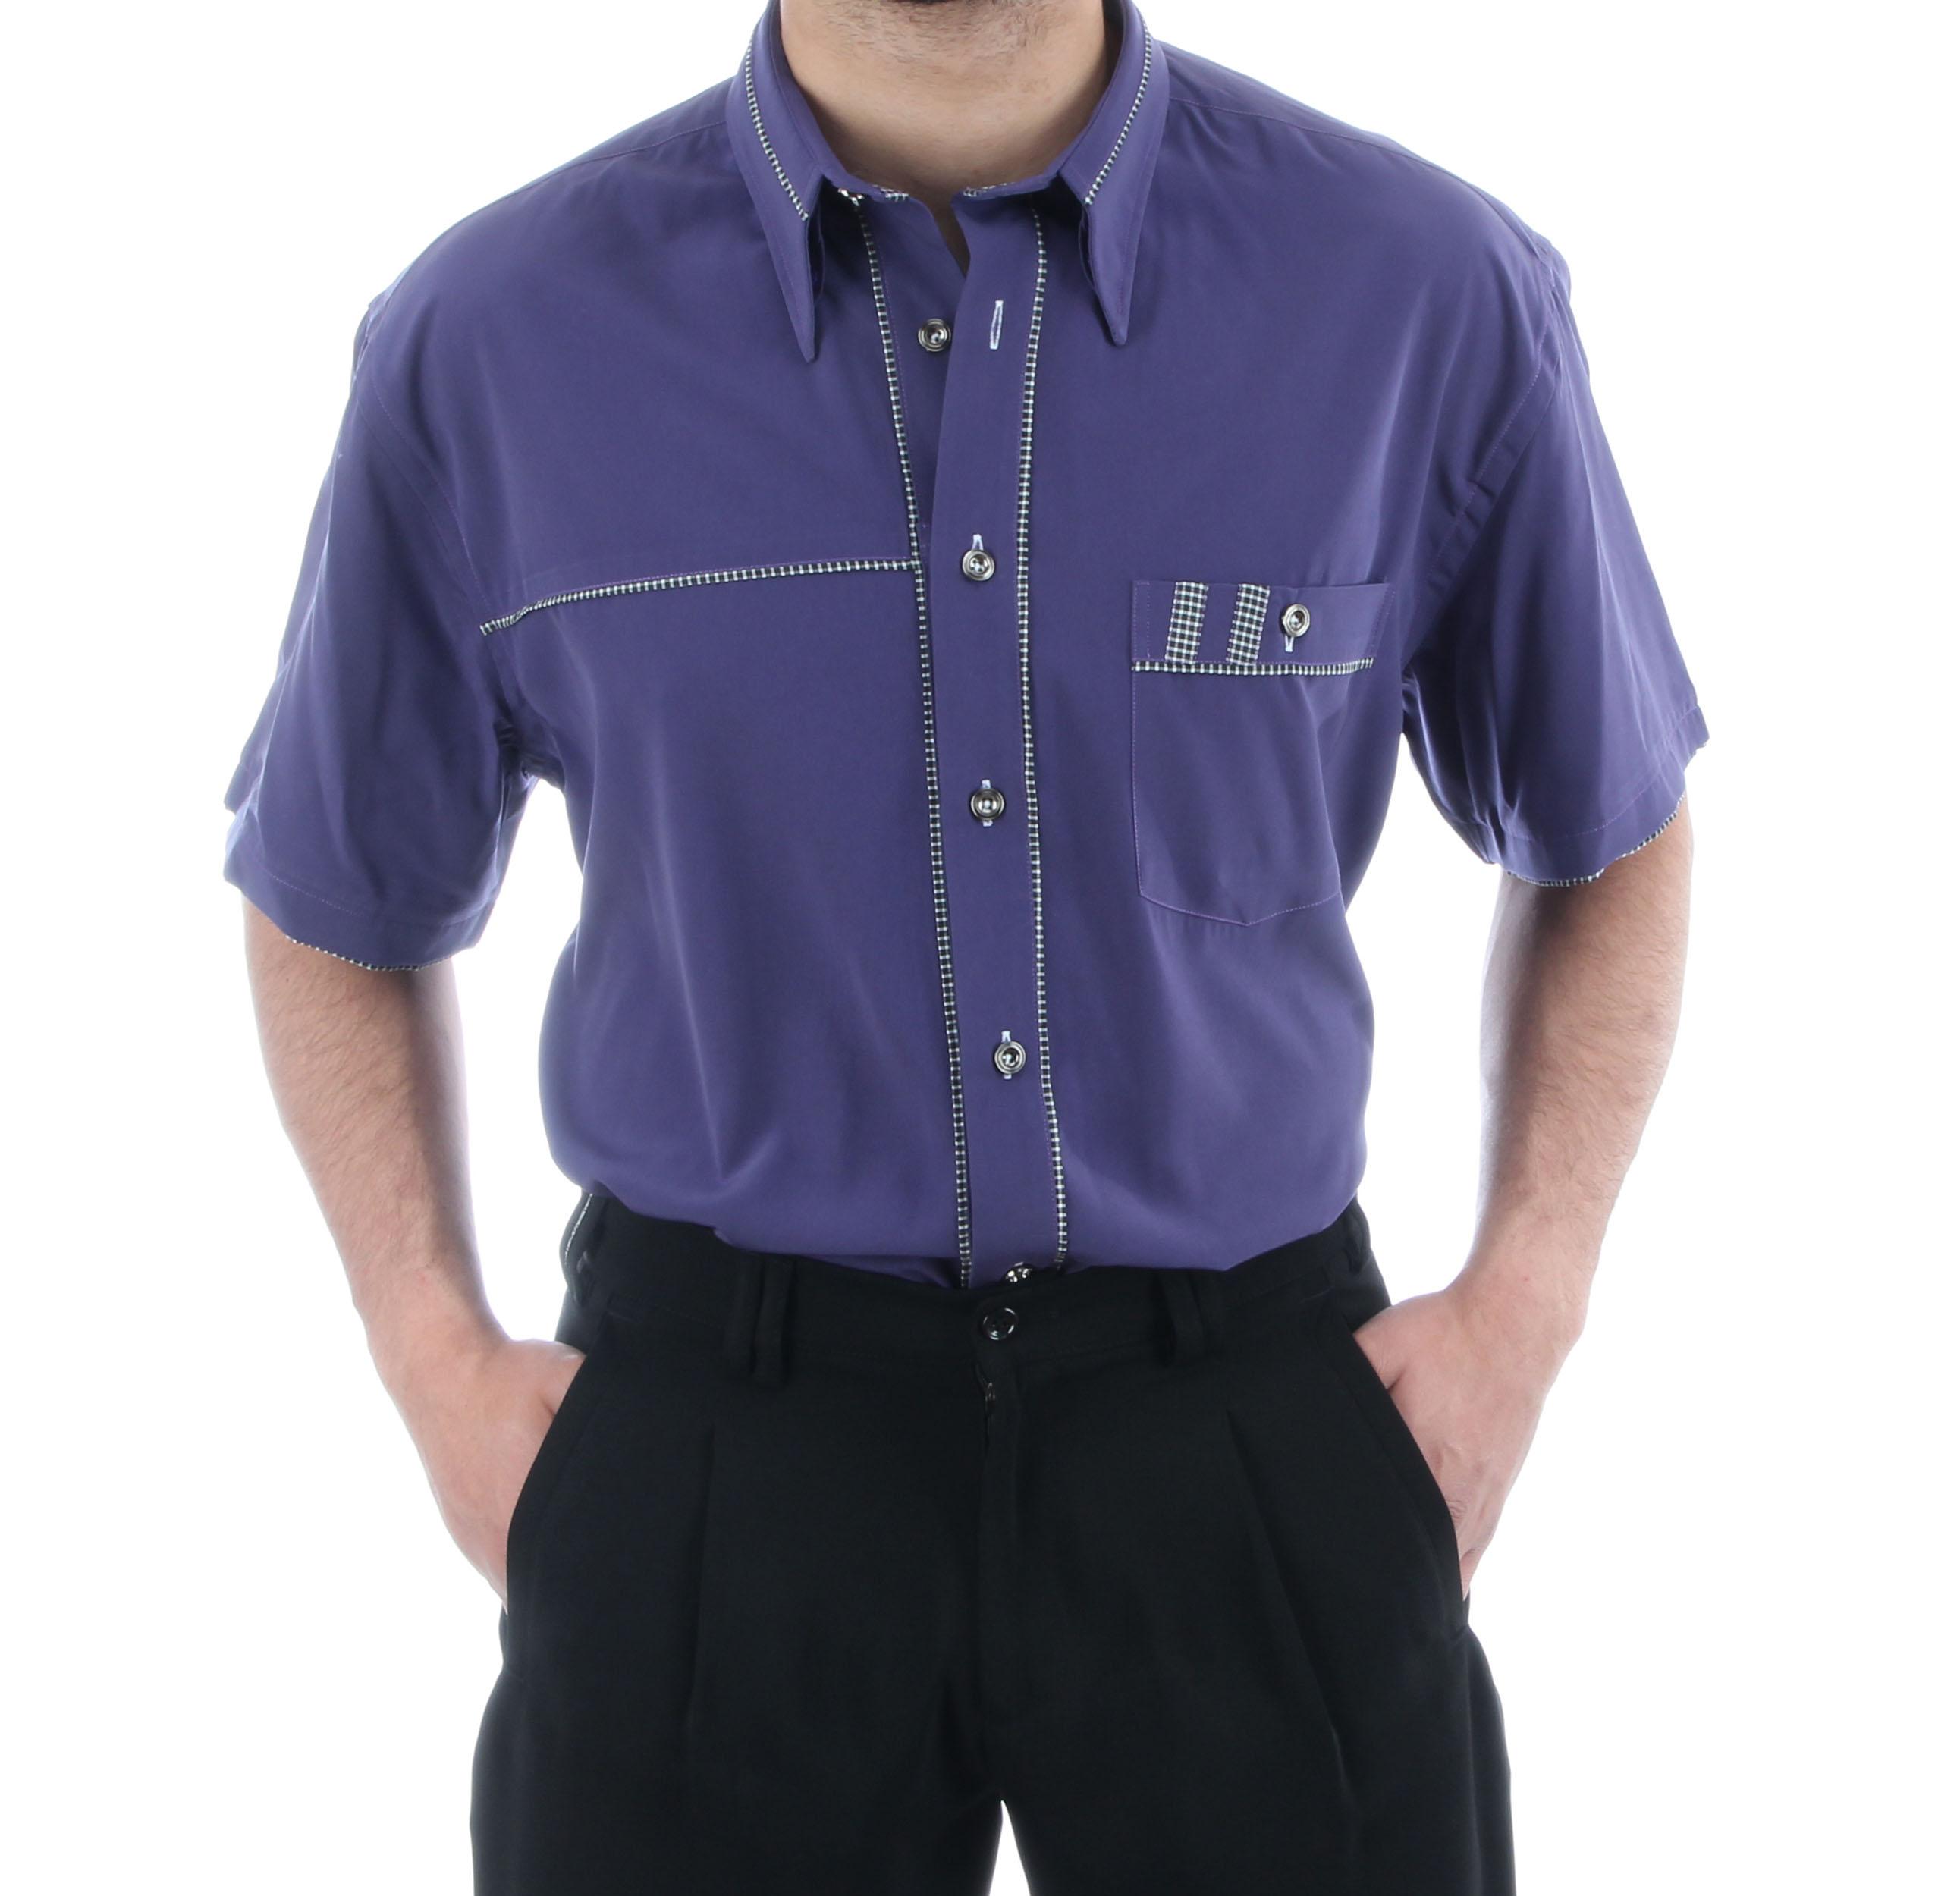 finest selection a4663 f7273 H.K. Mandel Kreative Mode für Männer - exklusives hemd ...